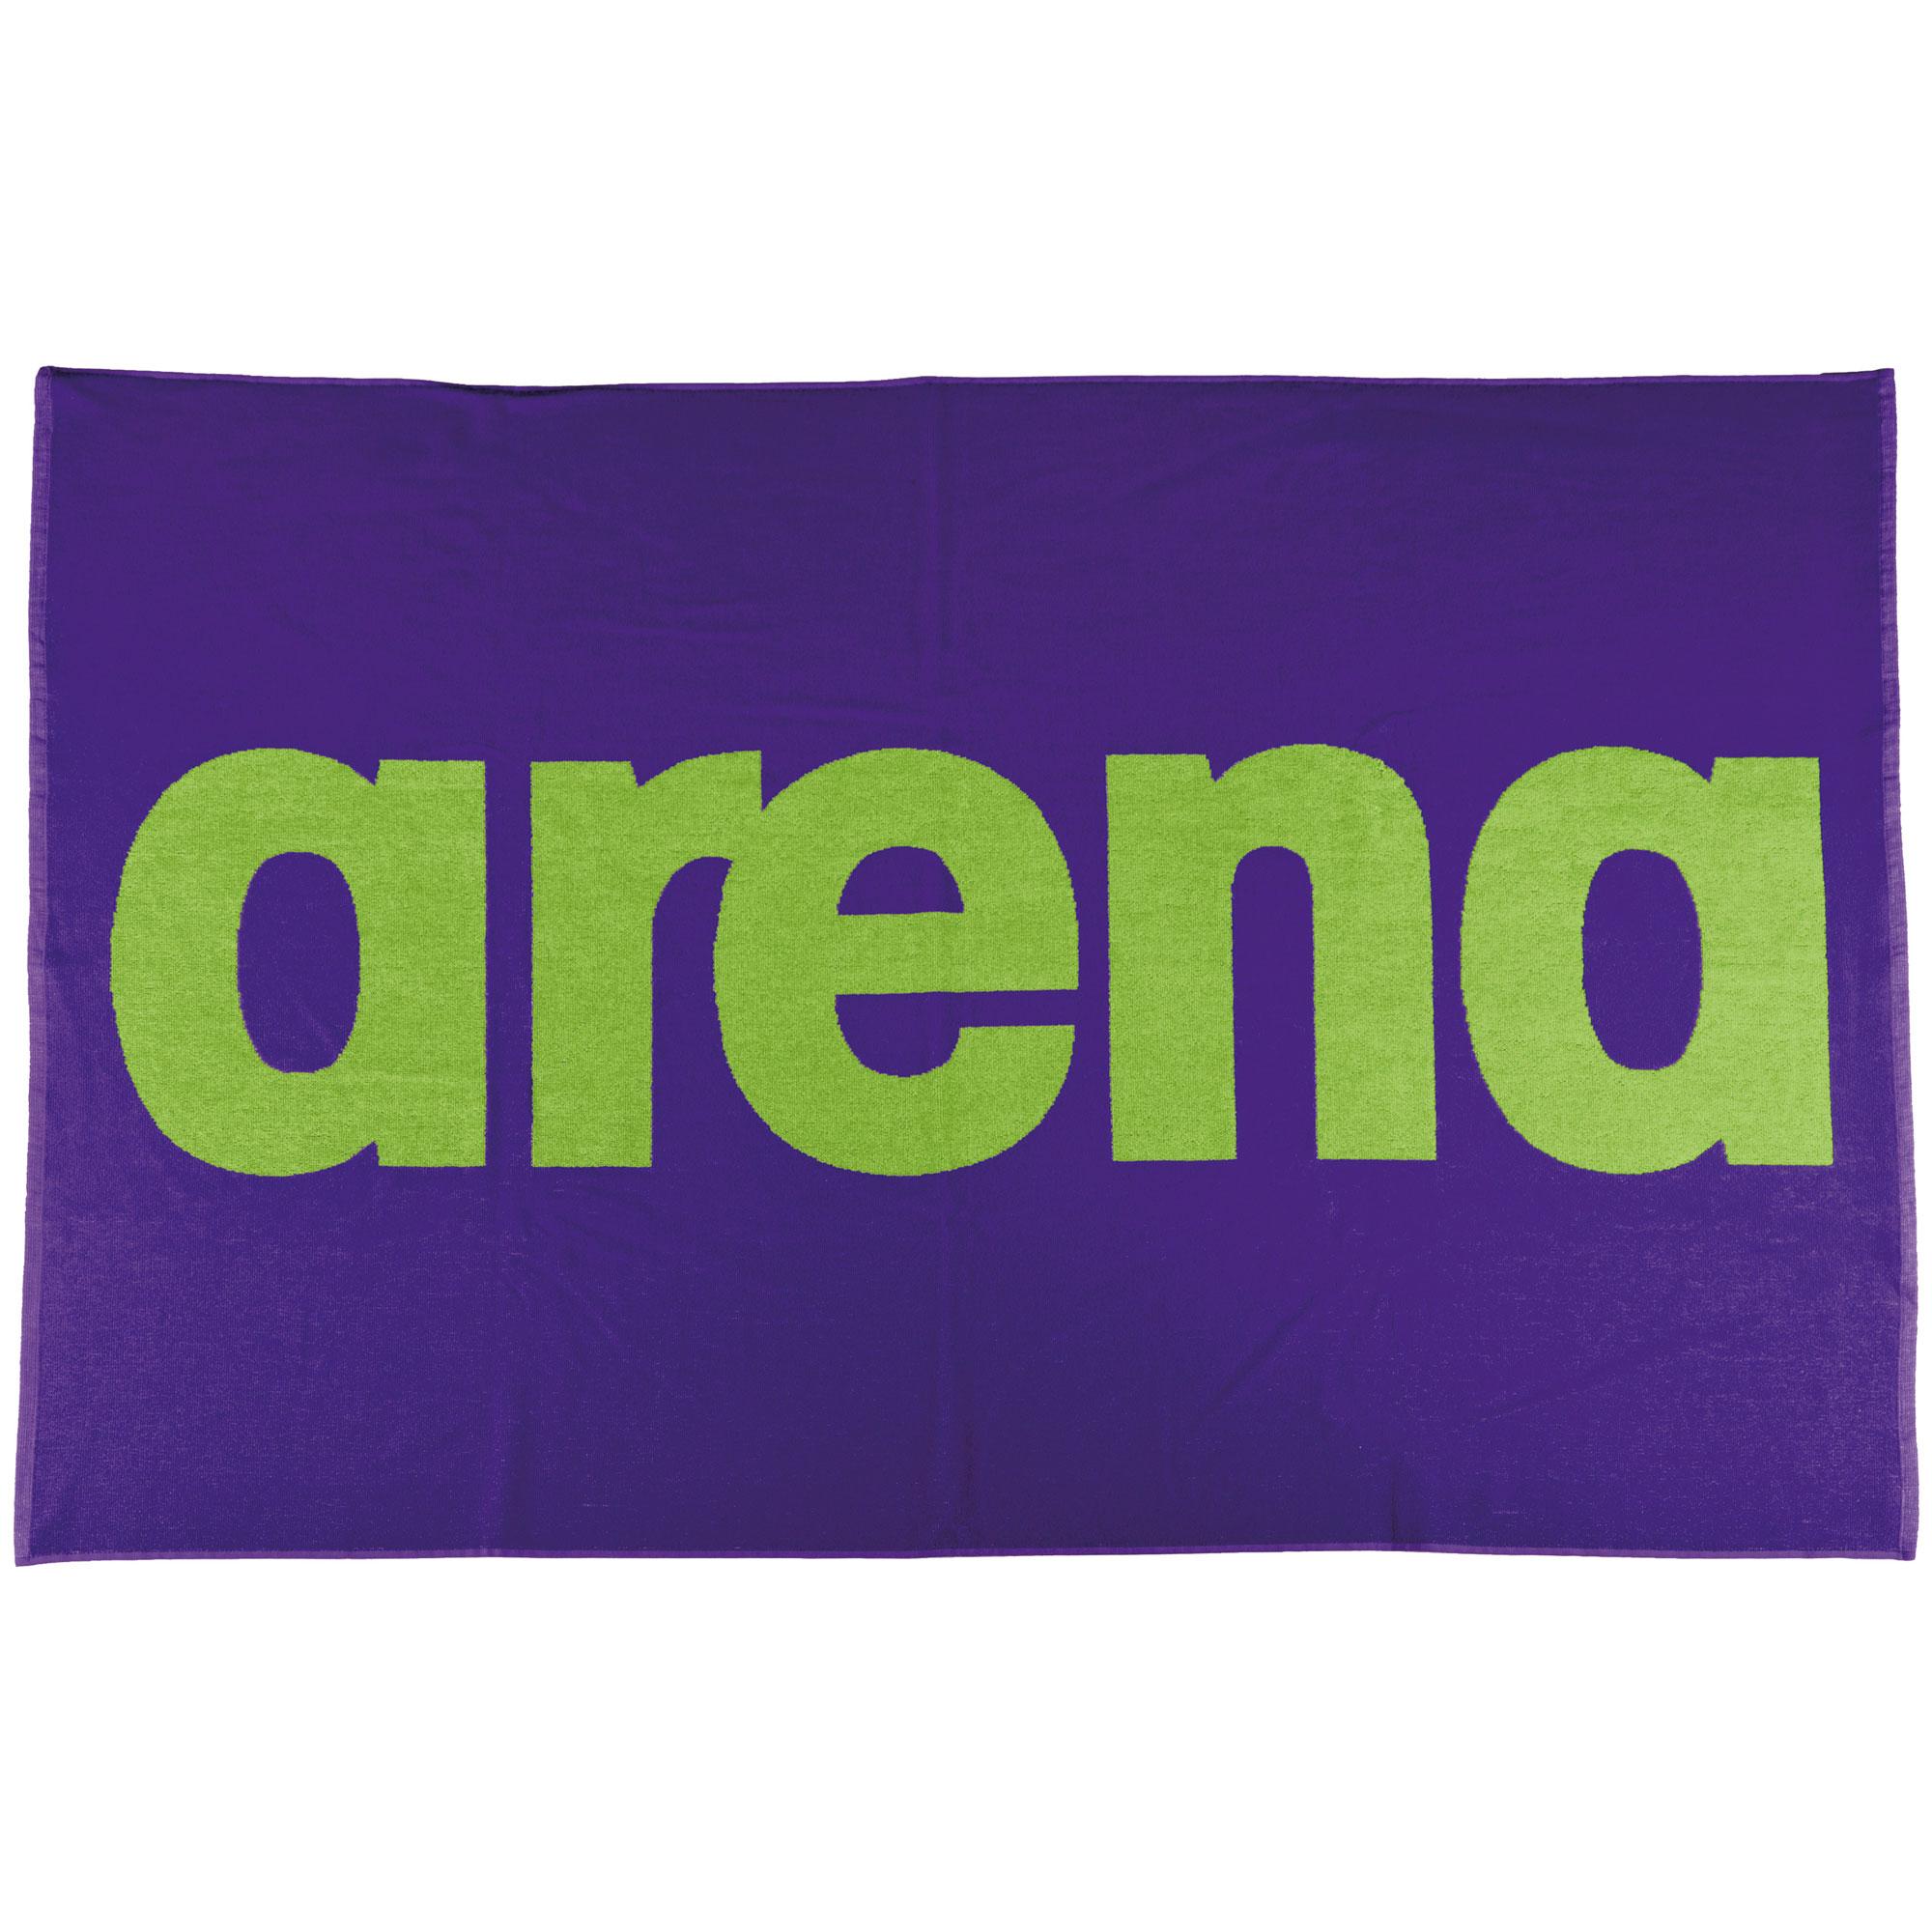 Arena Handtuch groß Handy 2A490-906